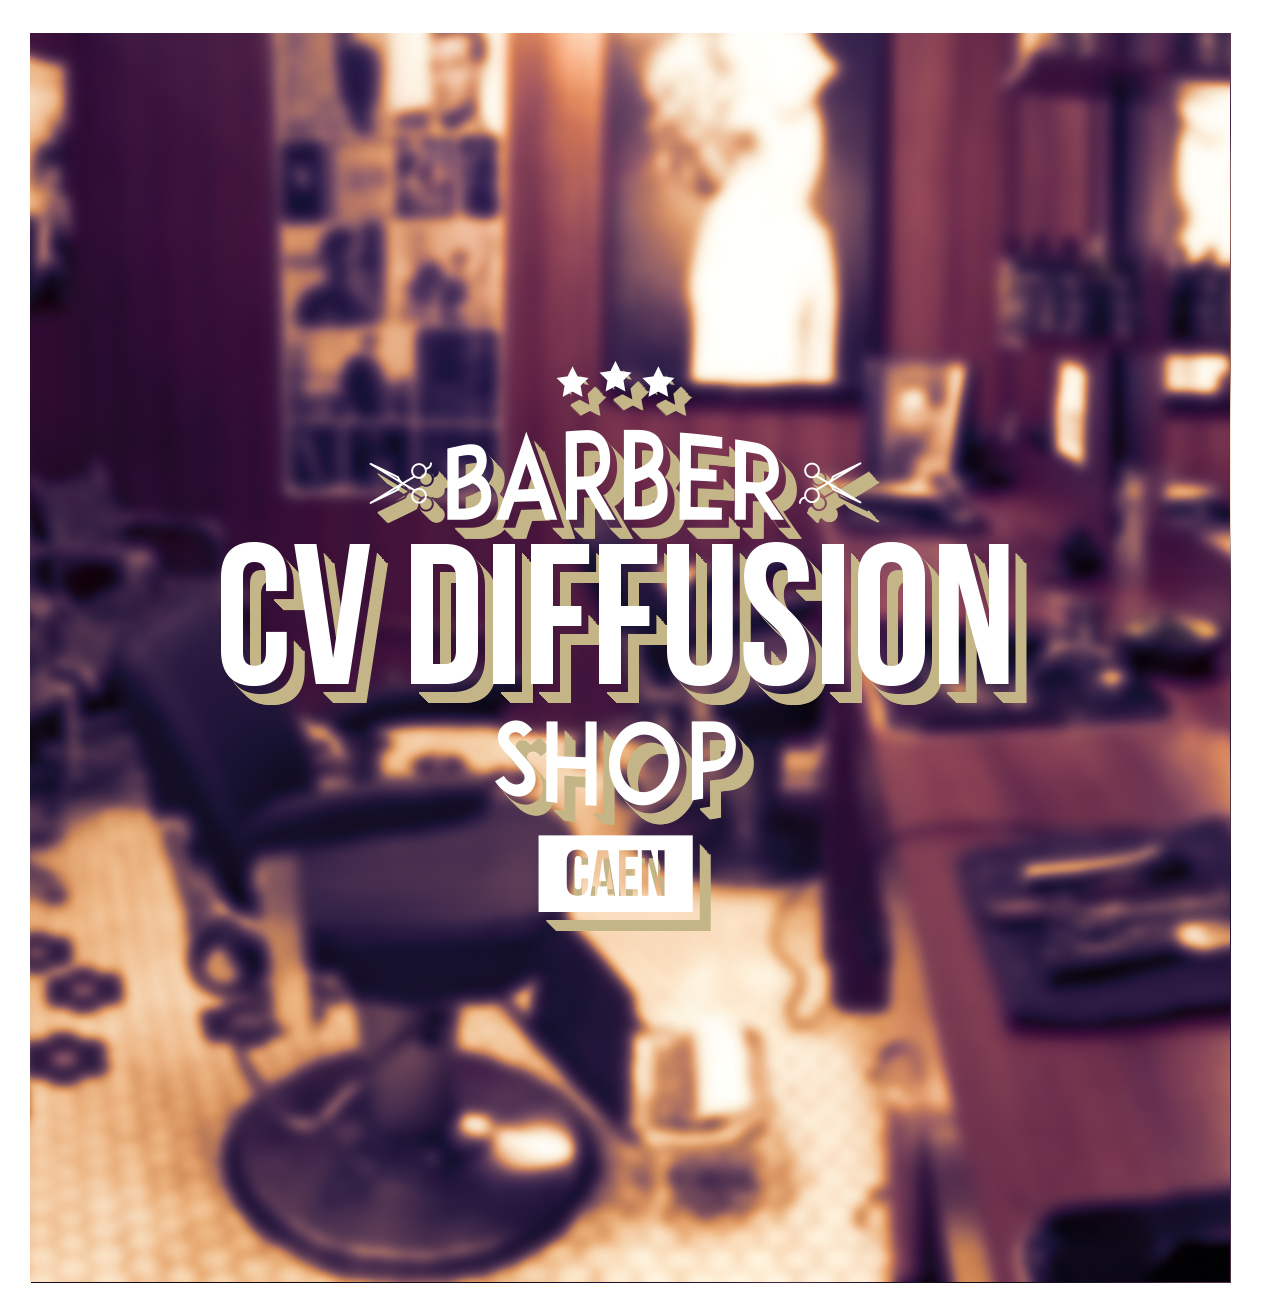 CV Diffusion Coiffeur